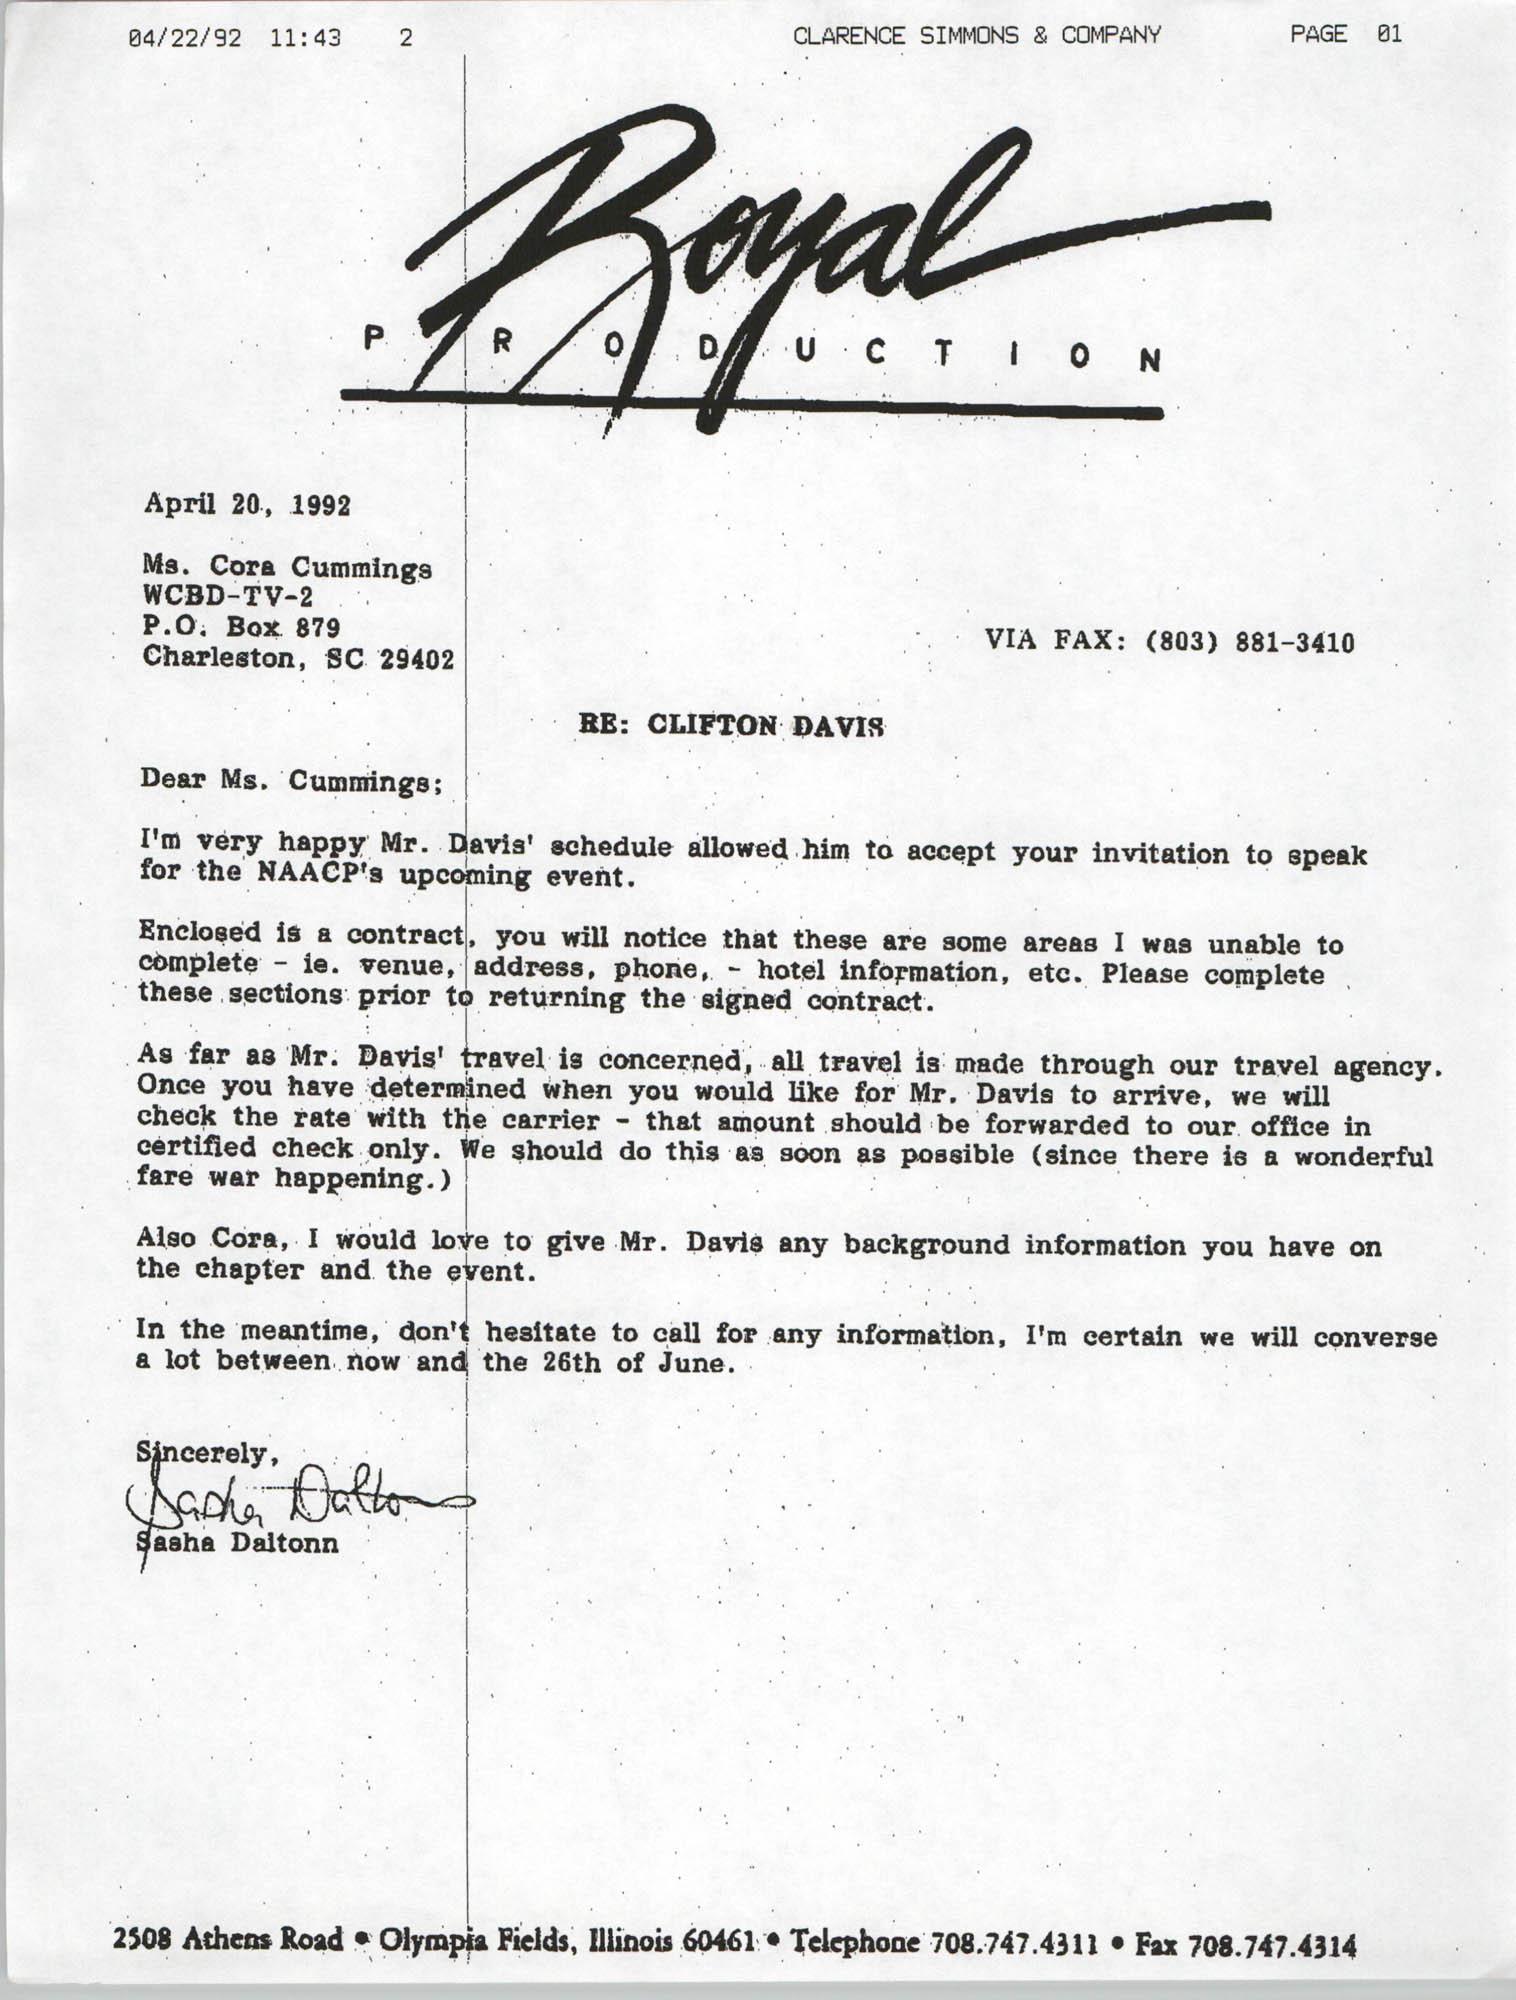 Letter from Sasha Dalton to Cora Cummings, April 20, 1992